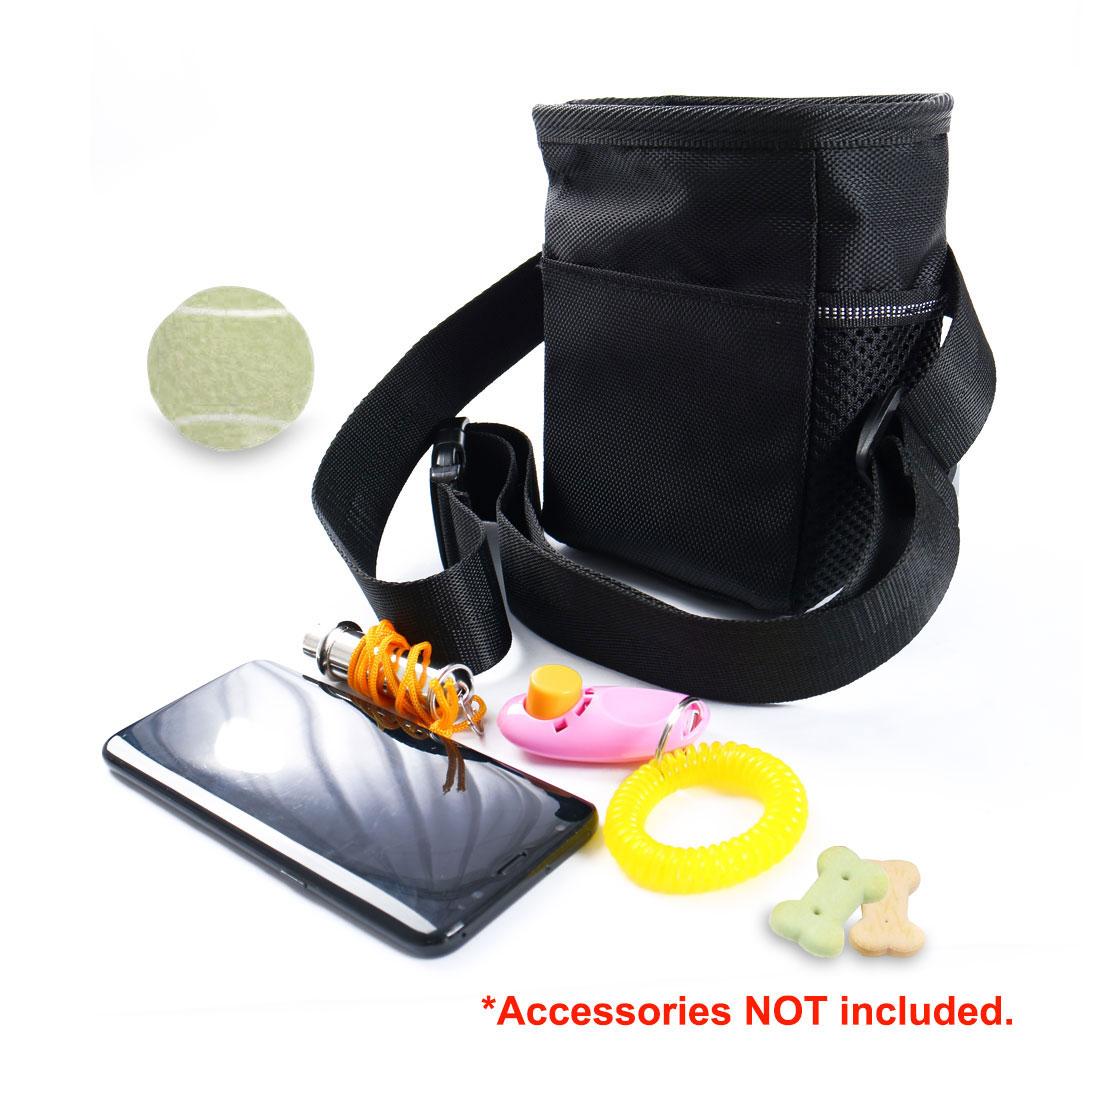 Dog Treat Training Pouch Bag Pet Training Accessory Holder Toy Bag Black